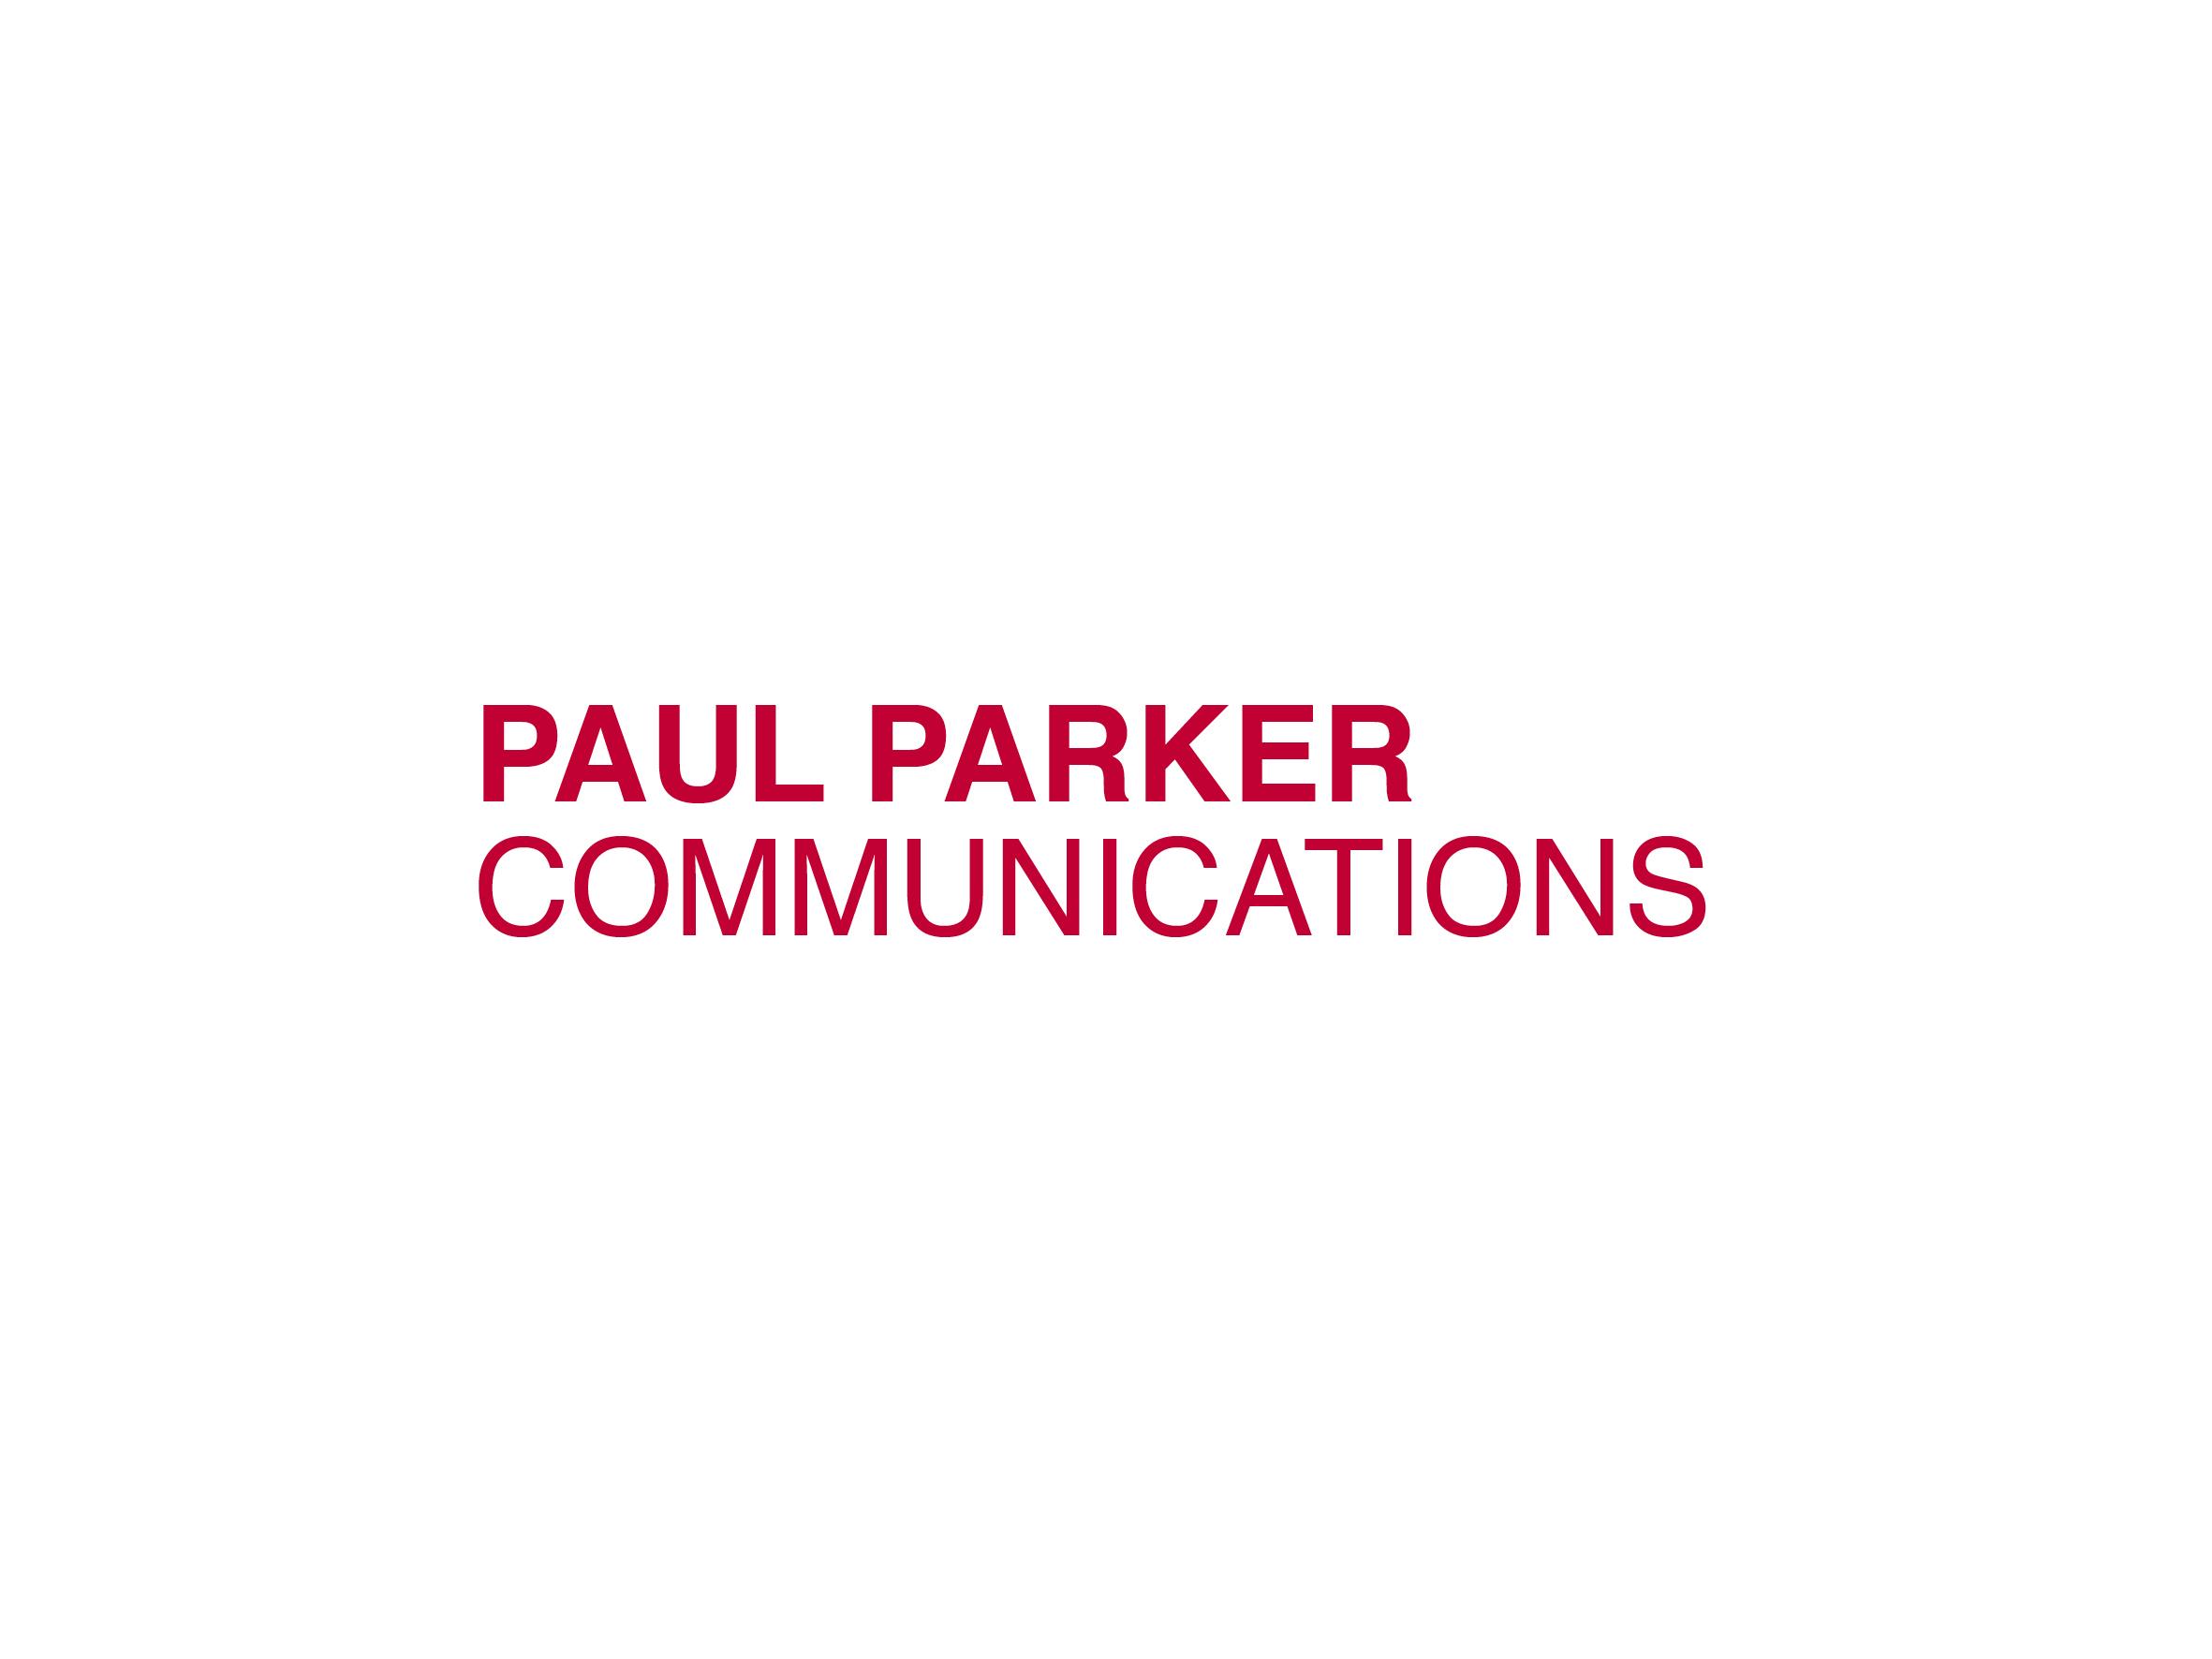 paul parker communications bradford logo design designed by Dakini Design Saltaire, Shipley, Bradford